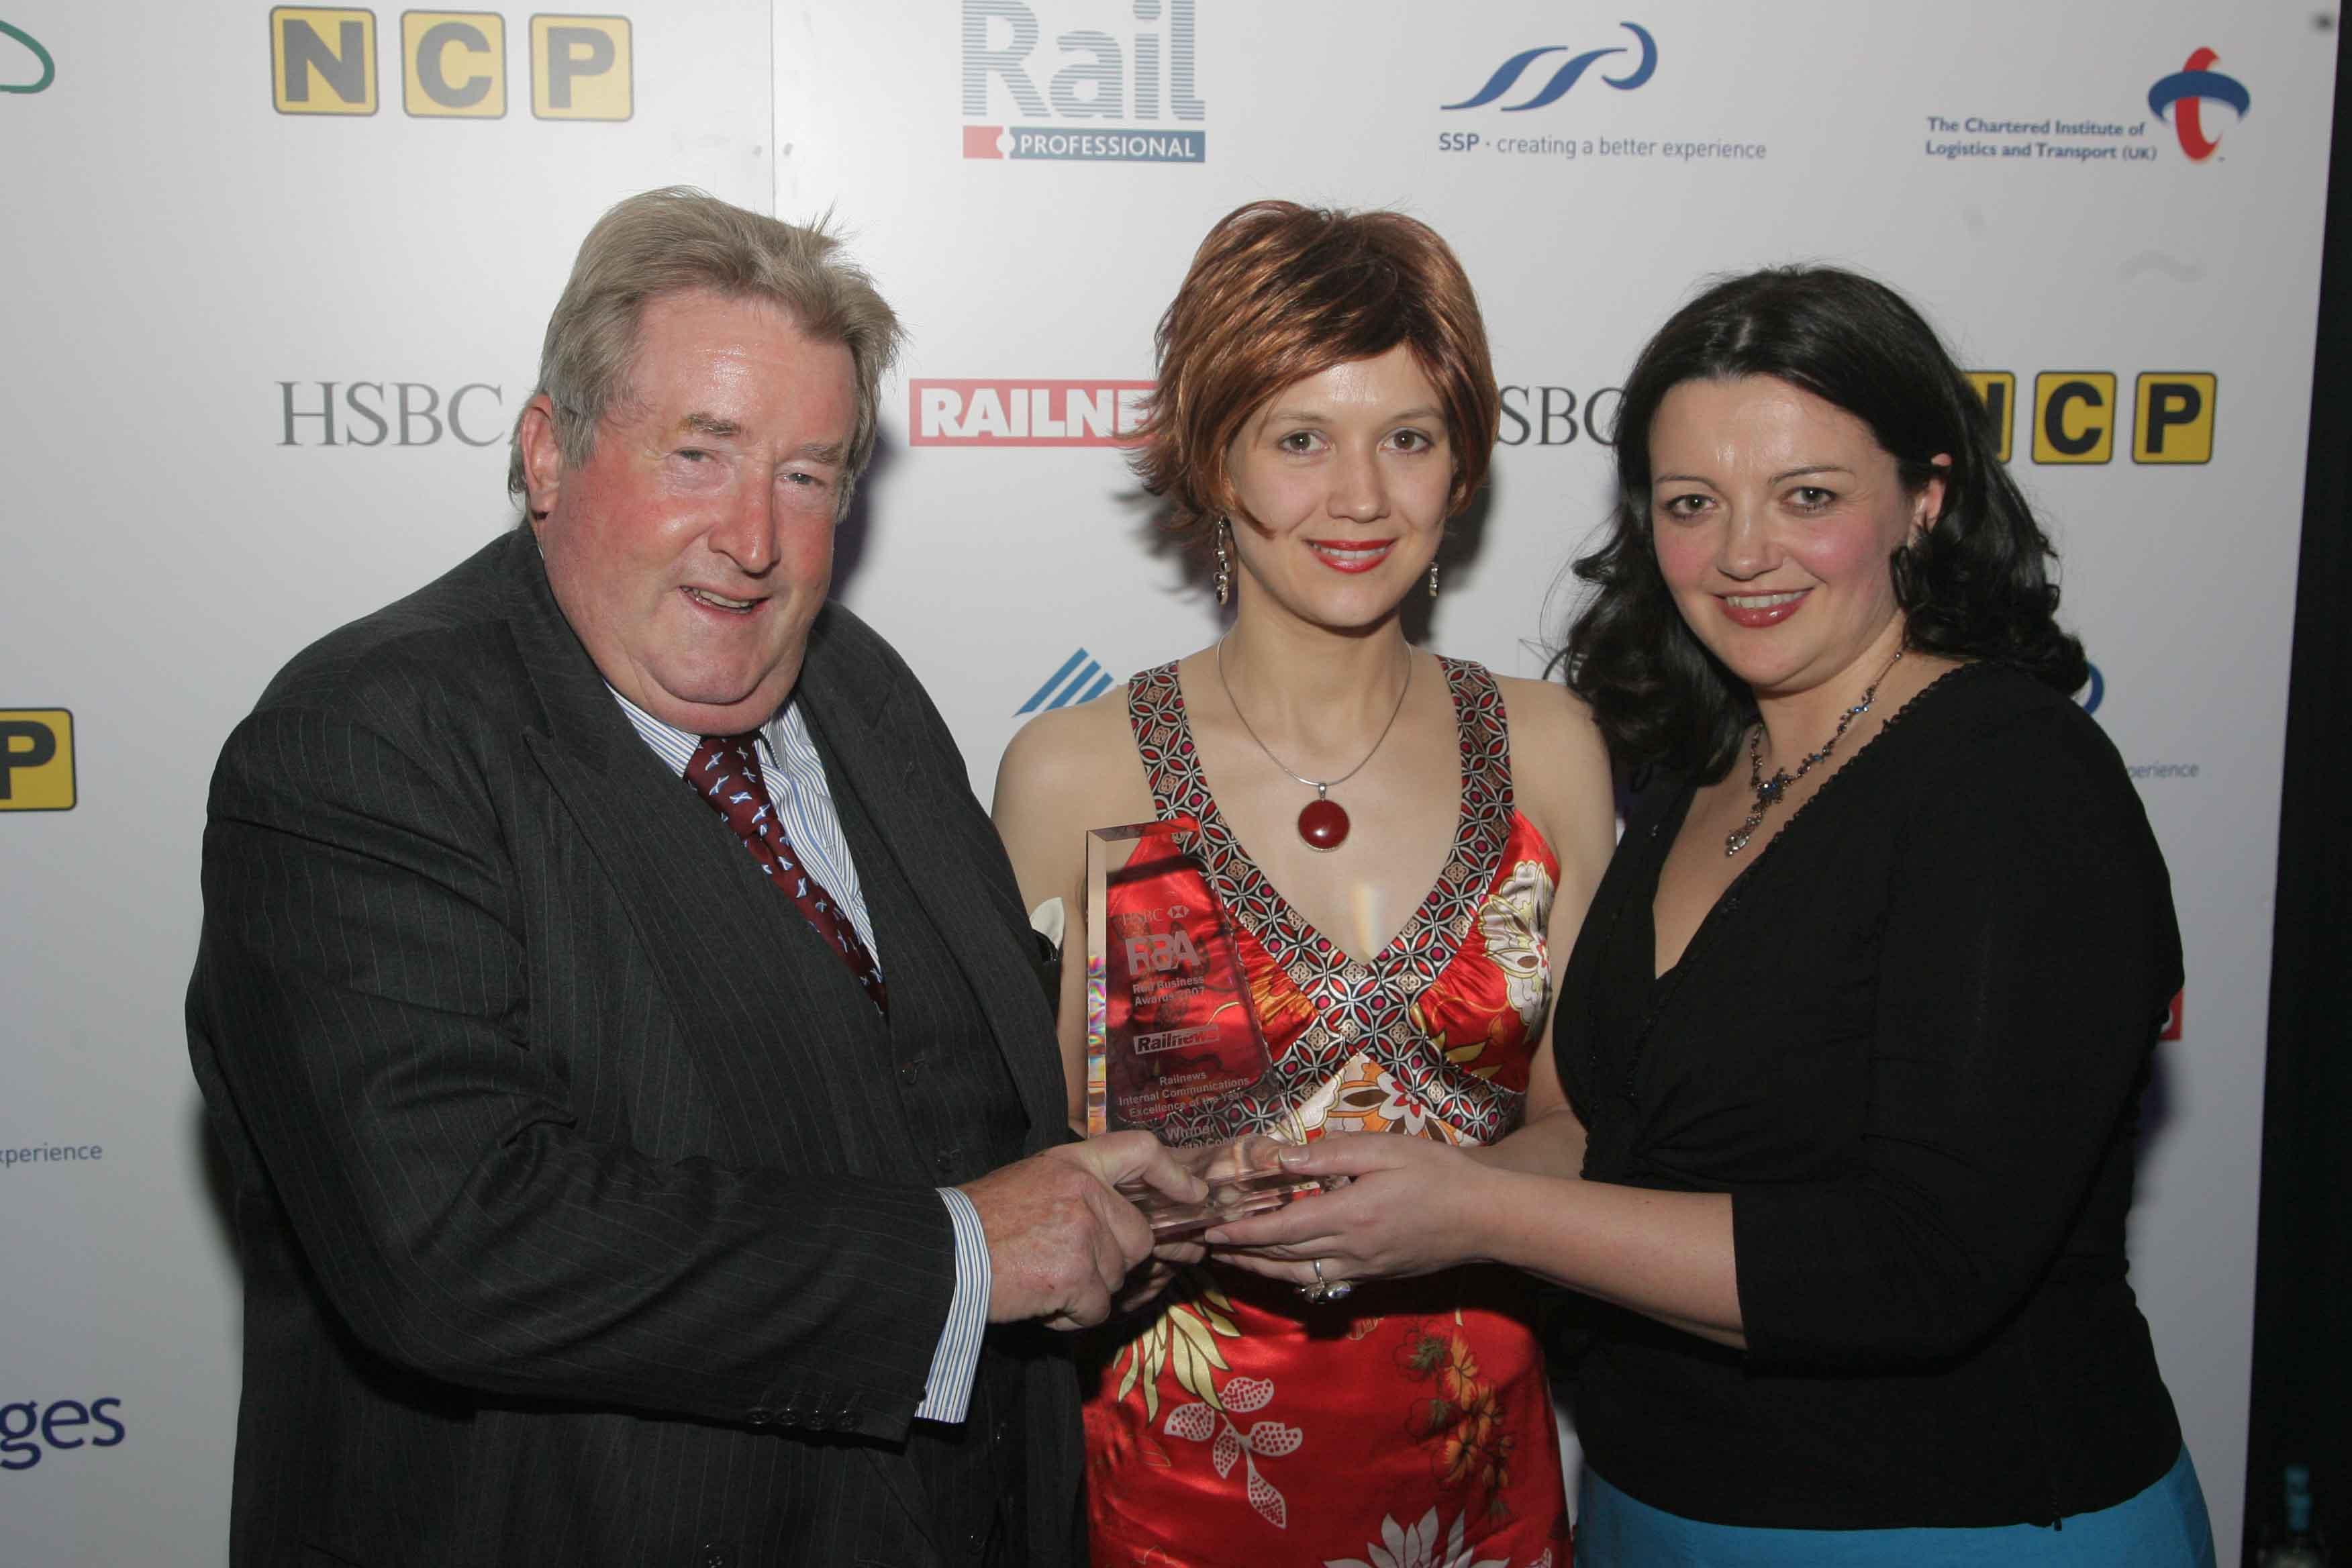 Sir Robert McAlpine, Miranda Luxford and myself